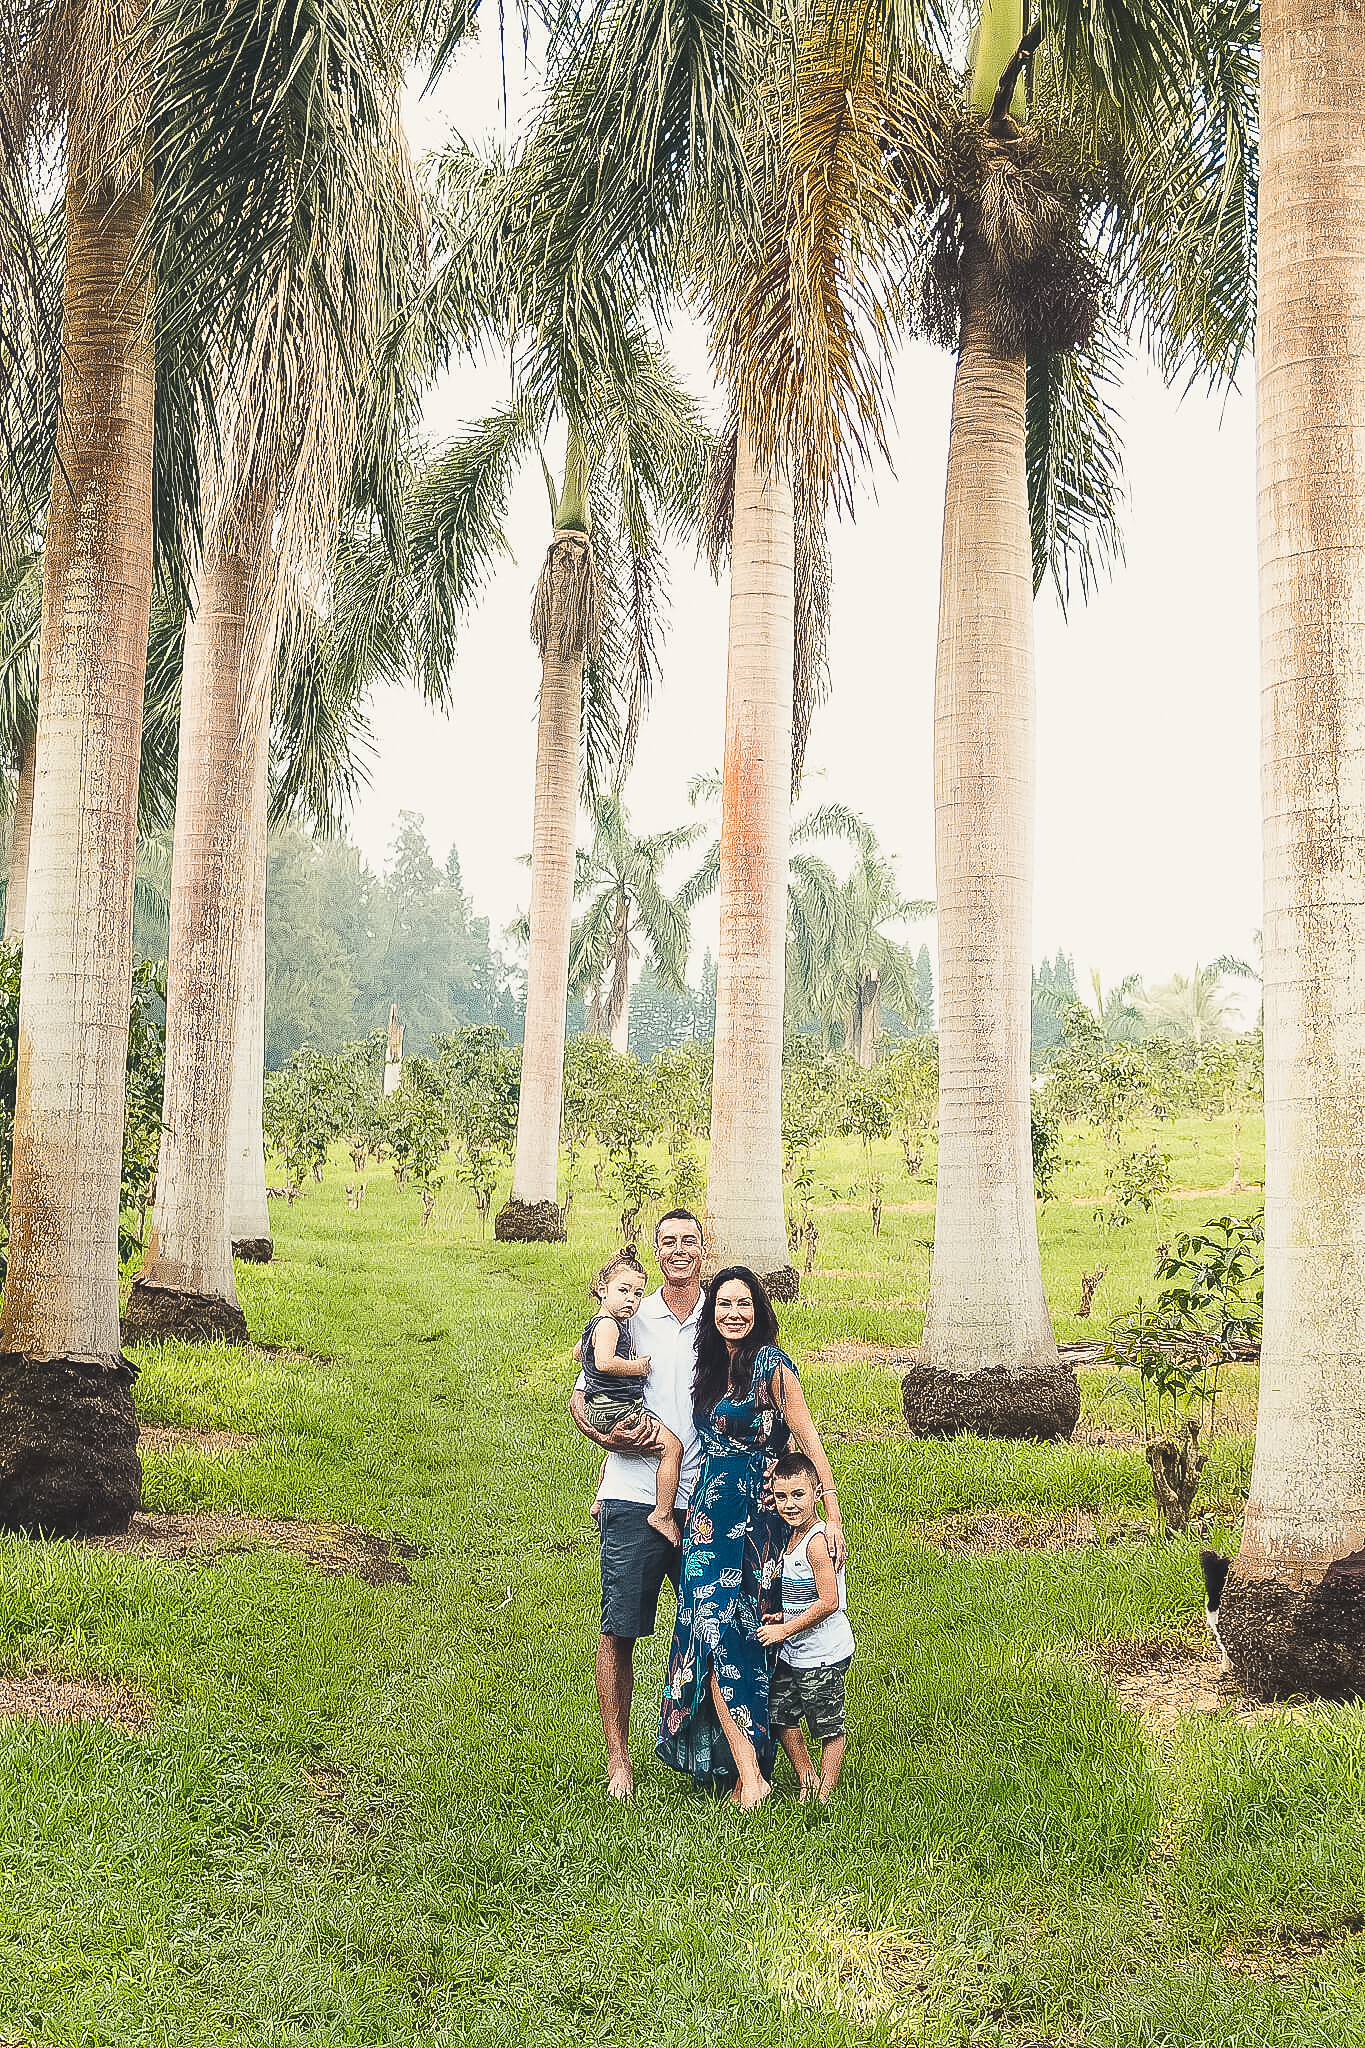 Family Home Lifestyle Session in Holualoa Kona Hawaii Big Island Photographer.jpg